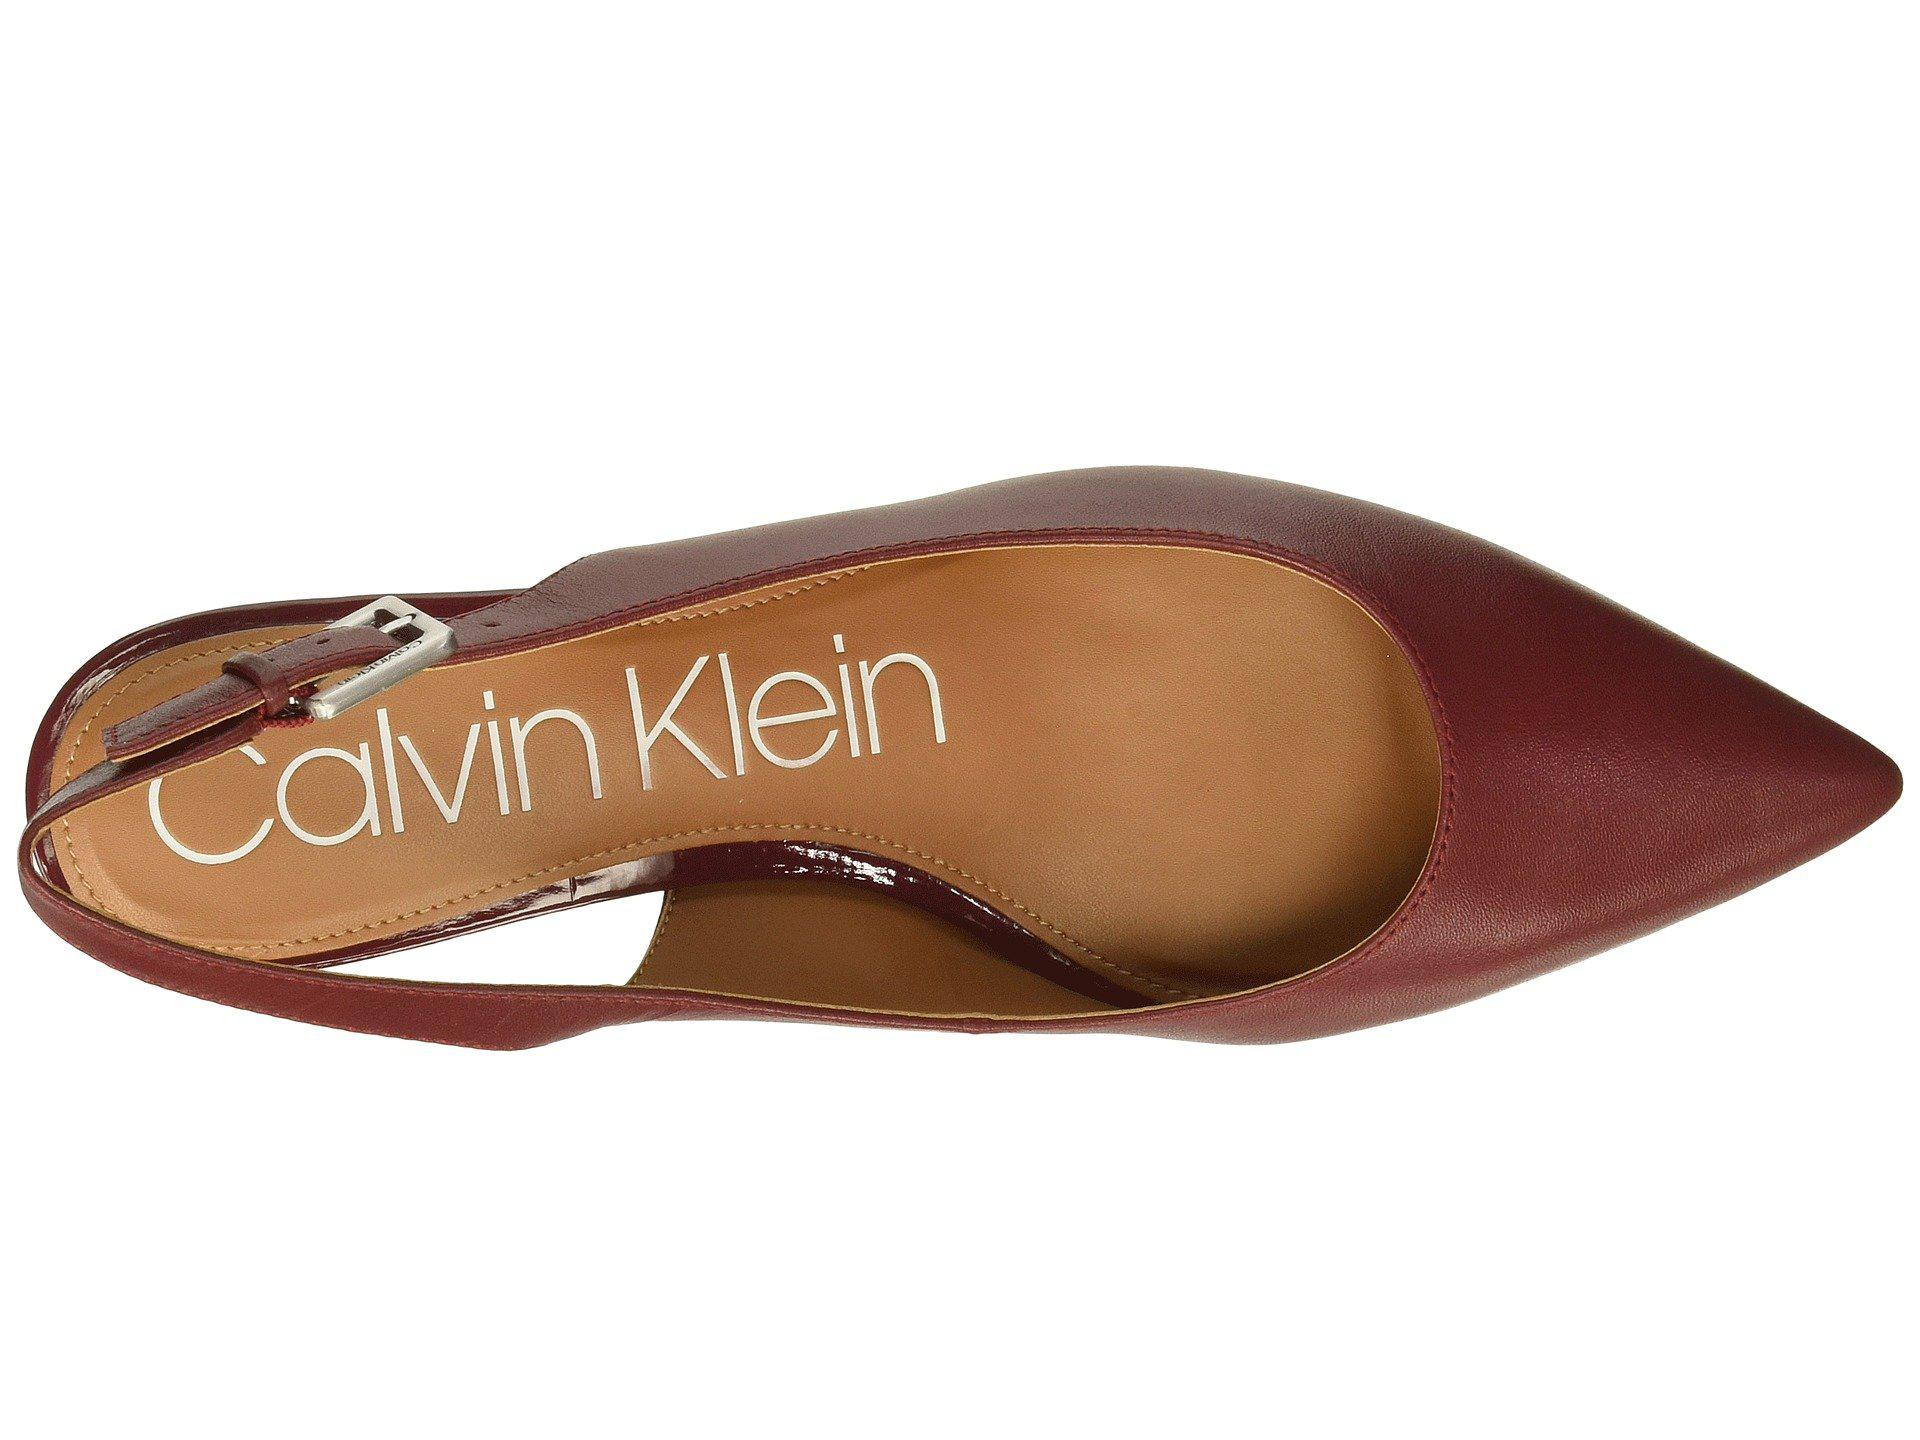 24430a306c3 Lyst - Calvin Klein Glorianne (red Rock Nappa) Women s Shoes